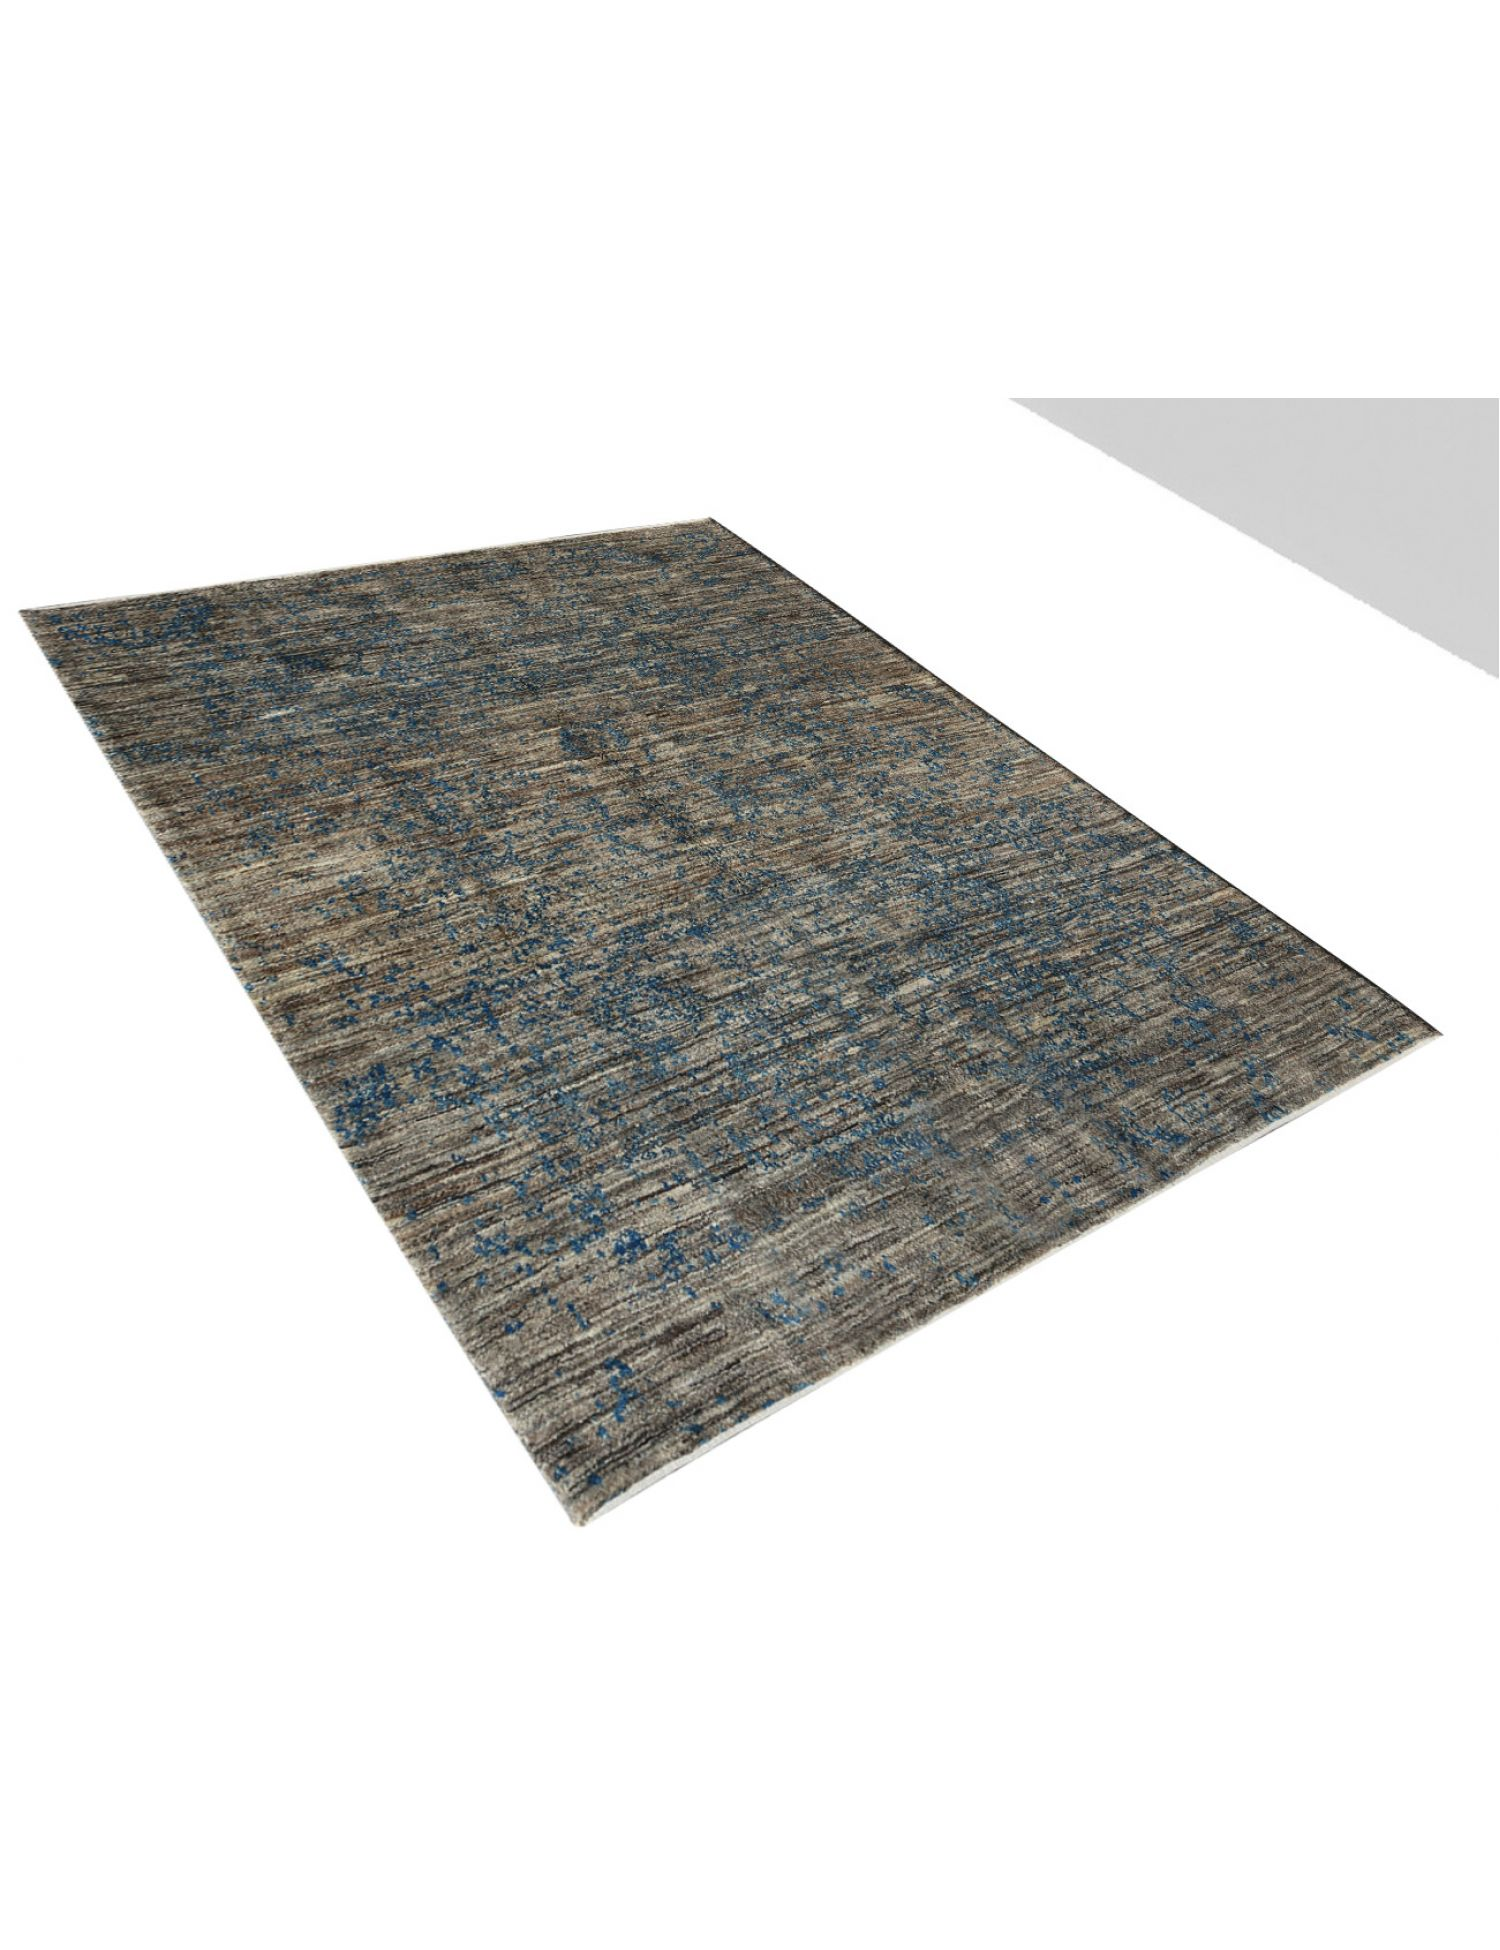 Moderne Teppiche  blau <br/>188 x 159 cm